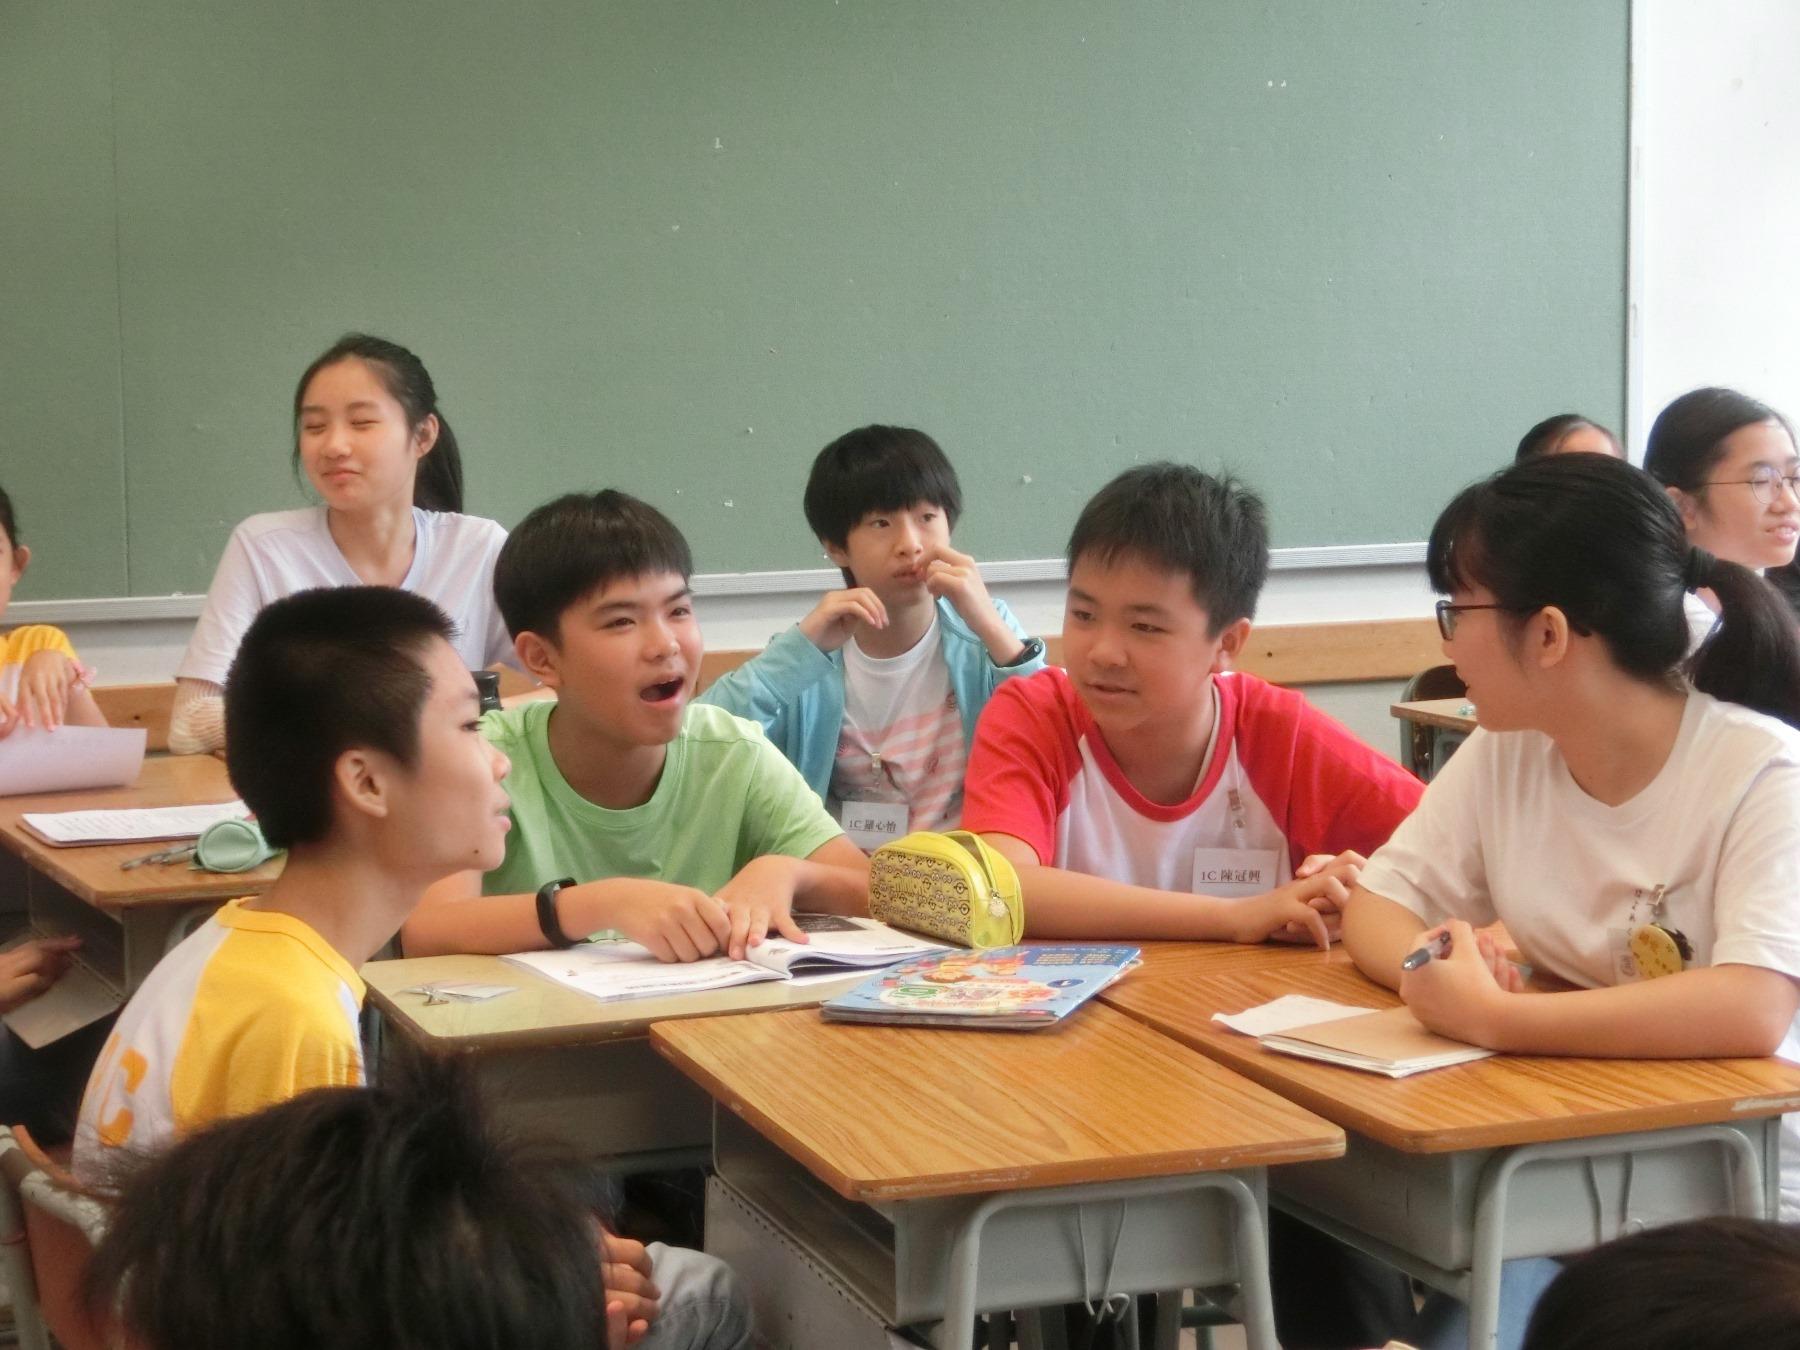 http://npc.edu.hk/sites/default/files/1c_dong_dong_nao_jin_da_bi_pin_01.jpg